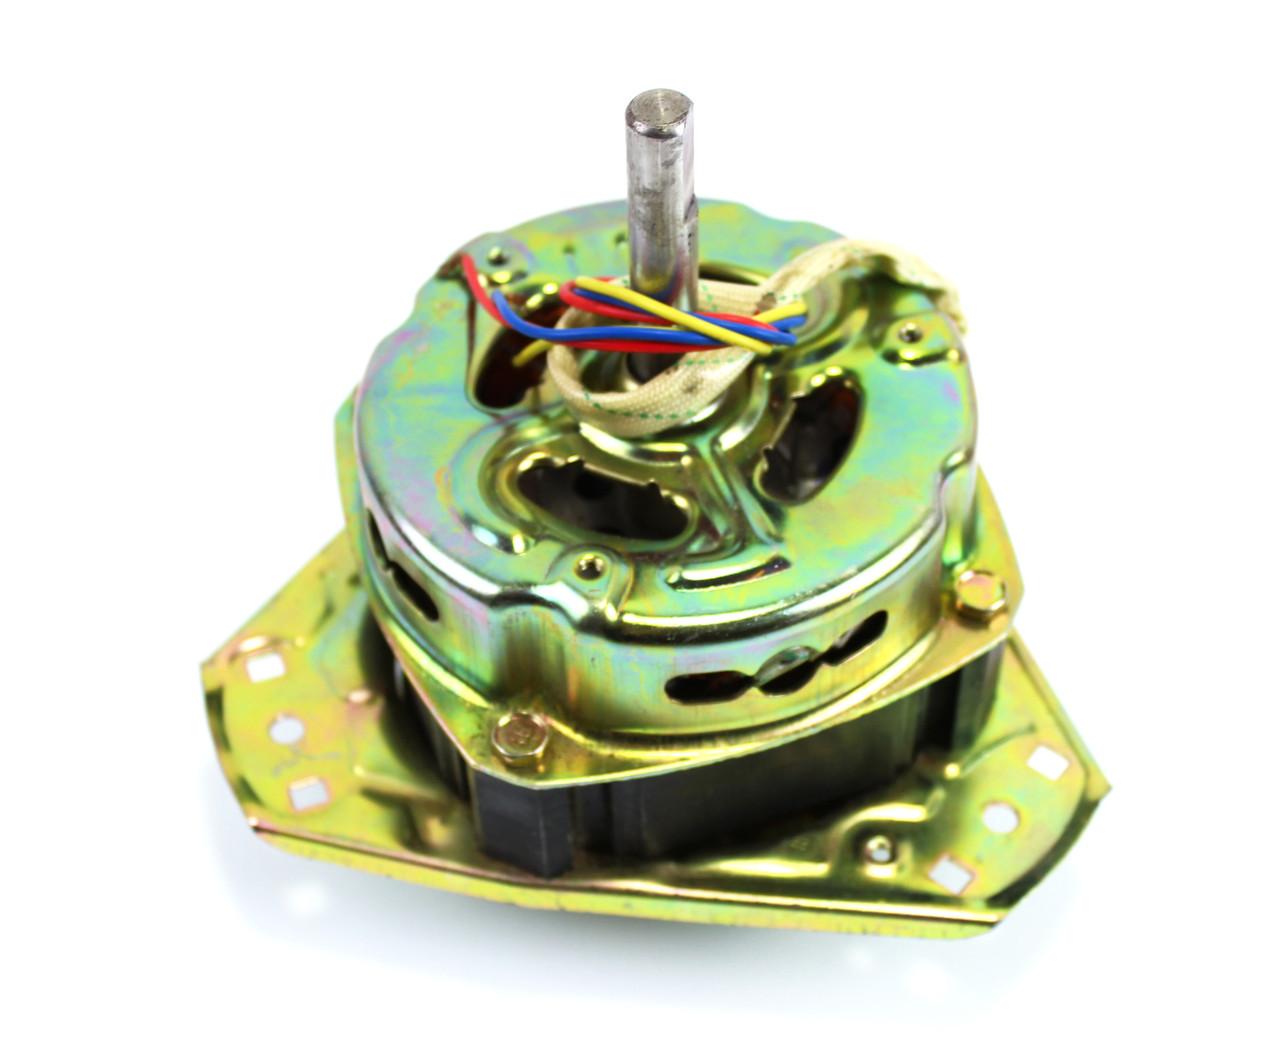 Двигун центрифуги пральної машини Сатурн XD 150 W (вал 10 мм)